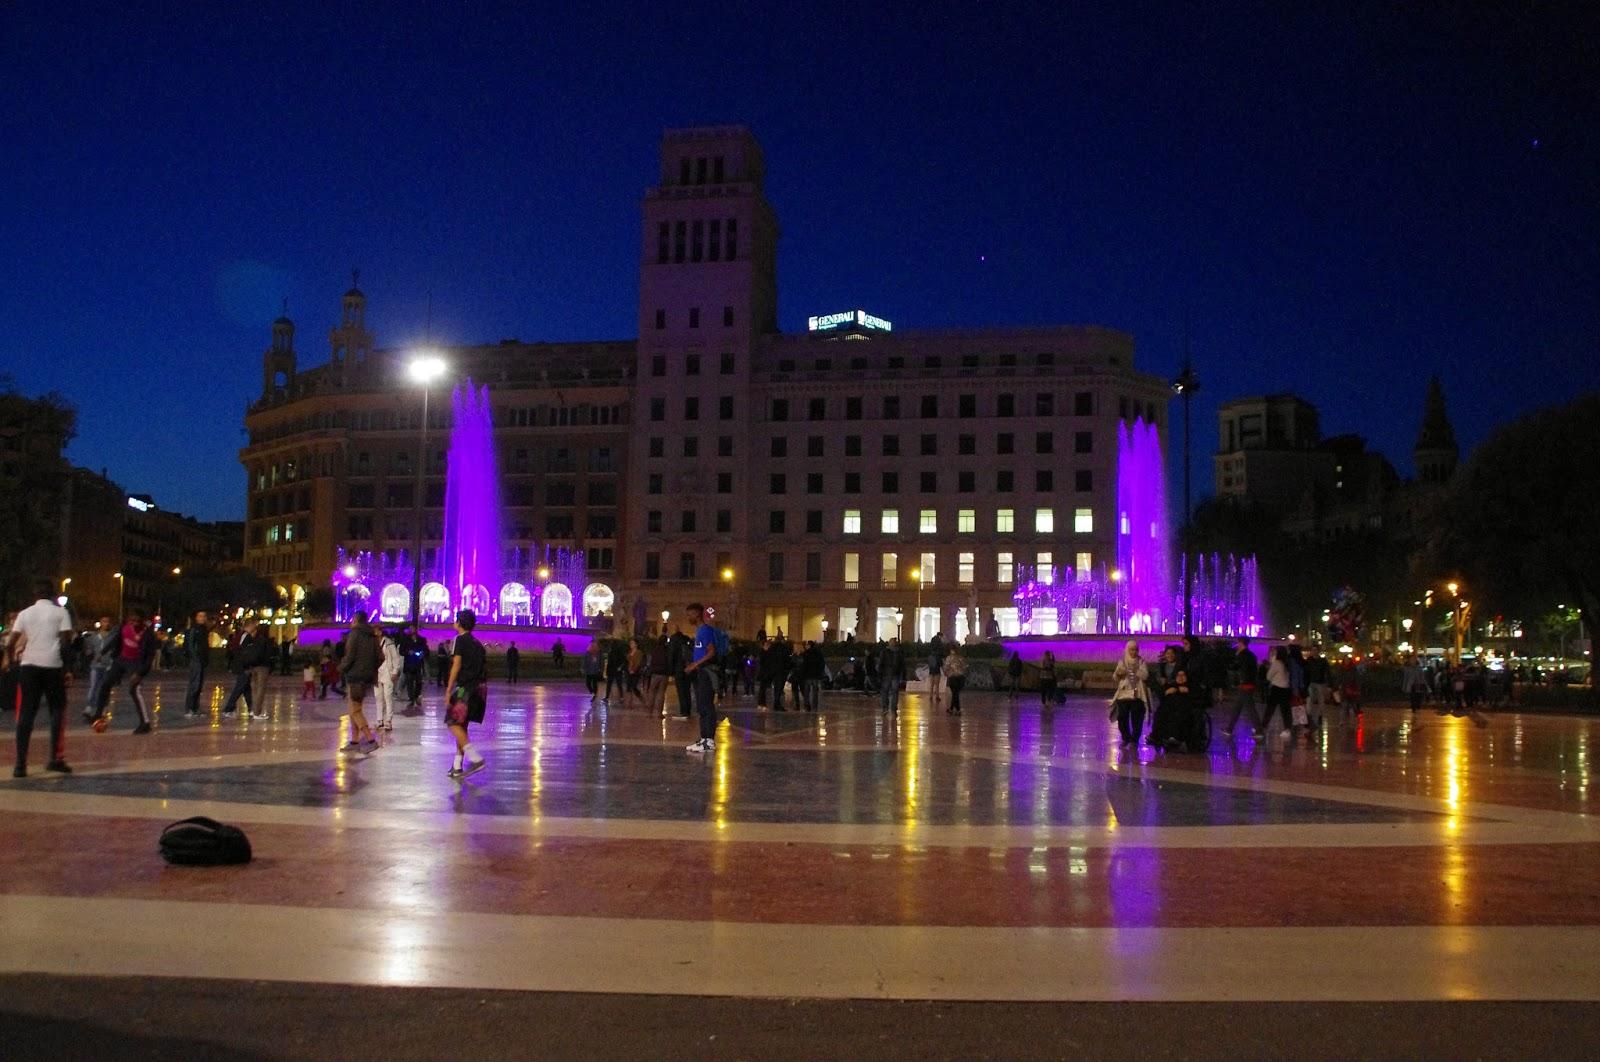 Plaça de Catalunya at night